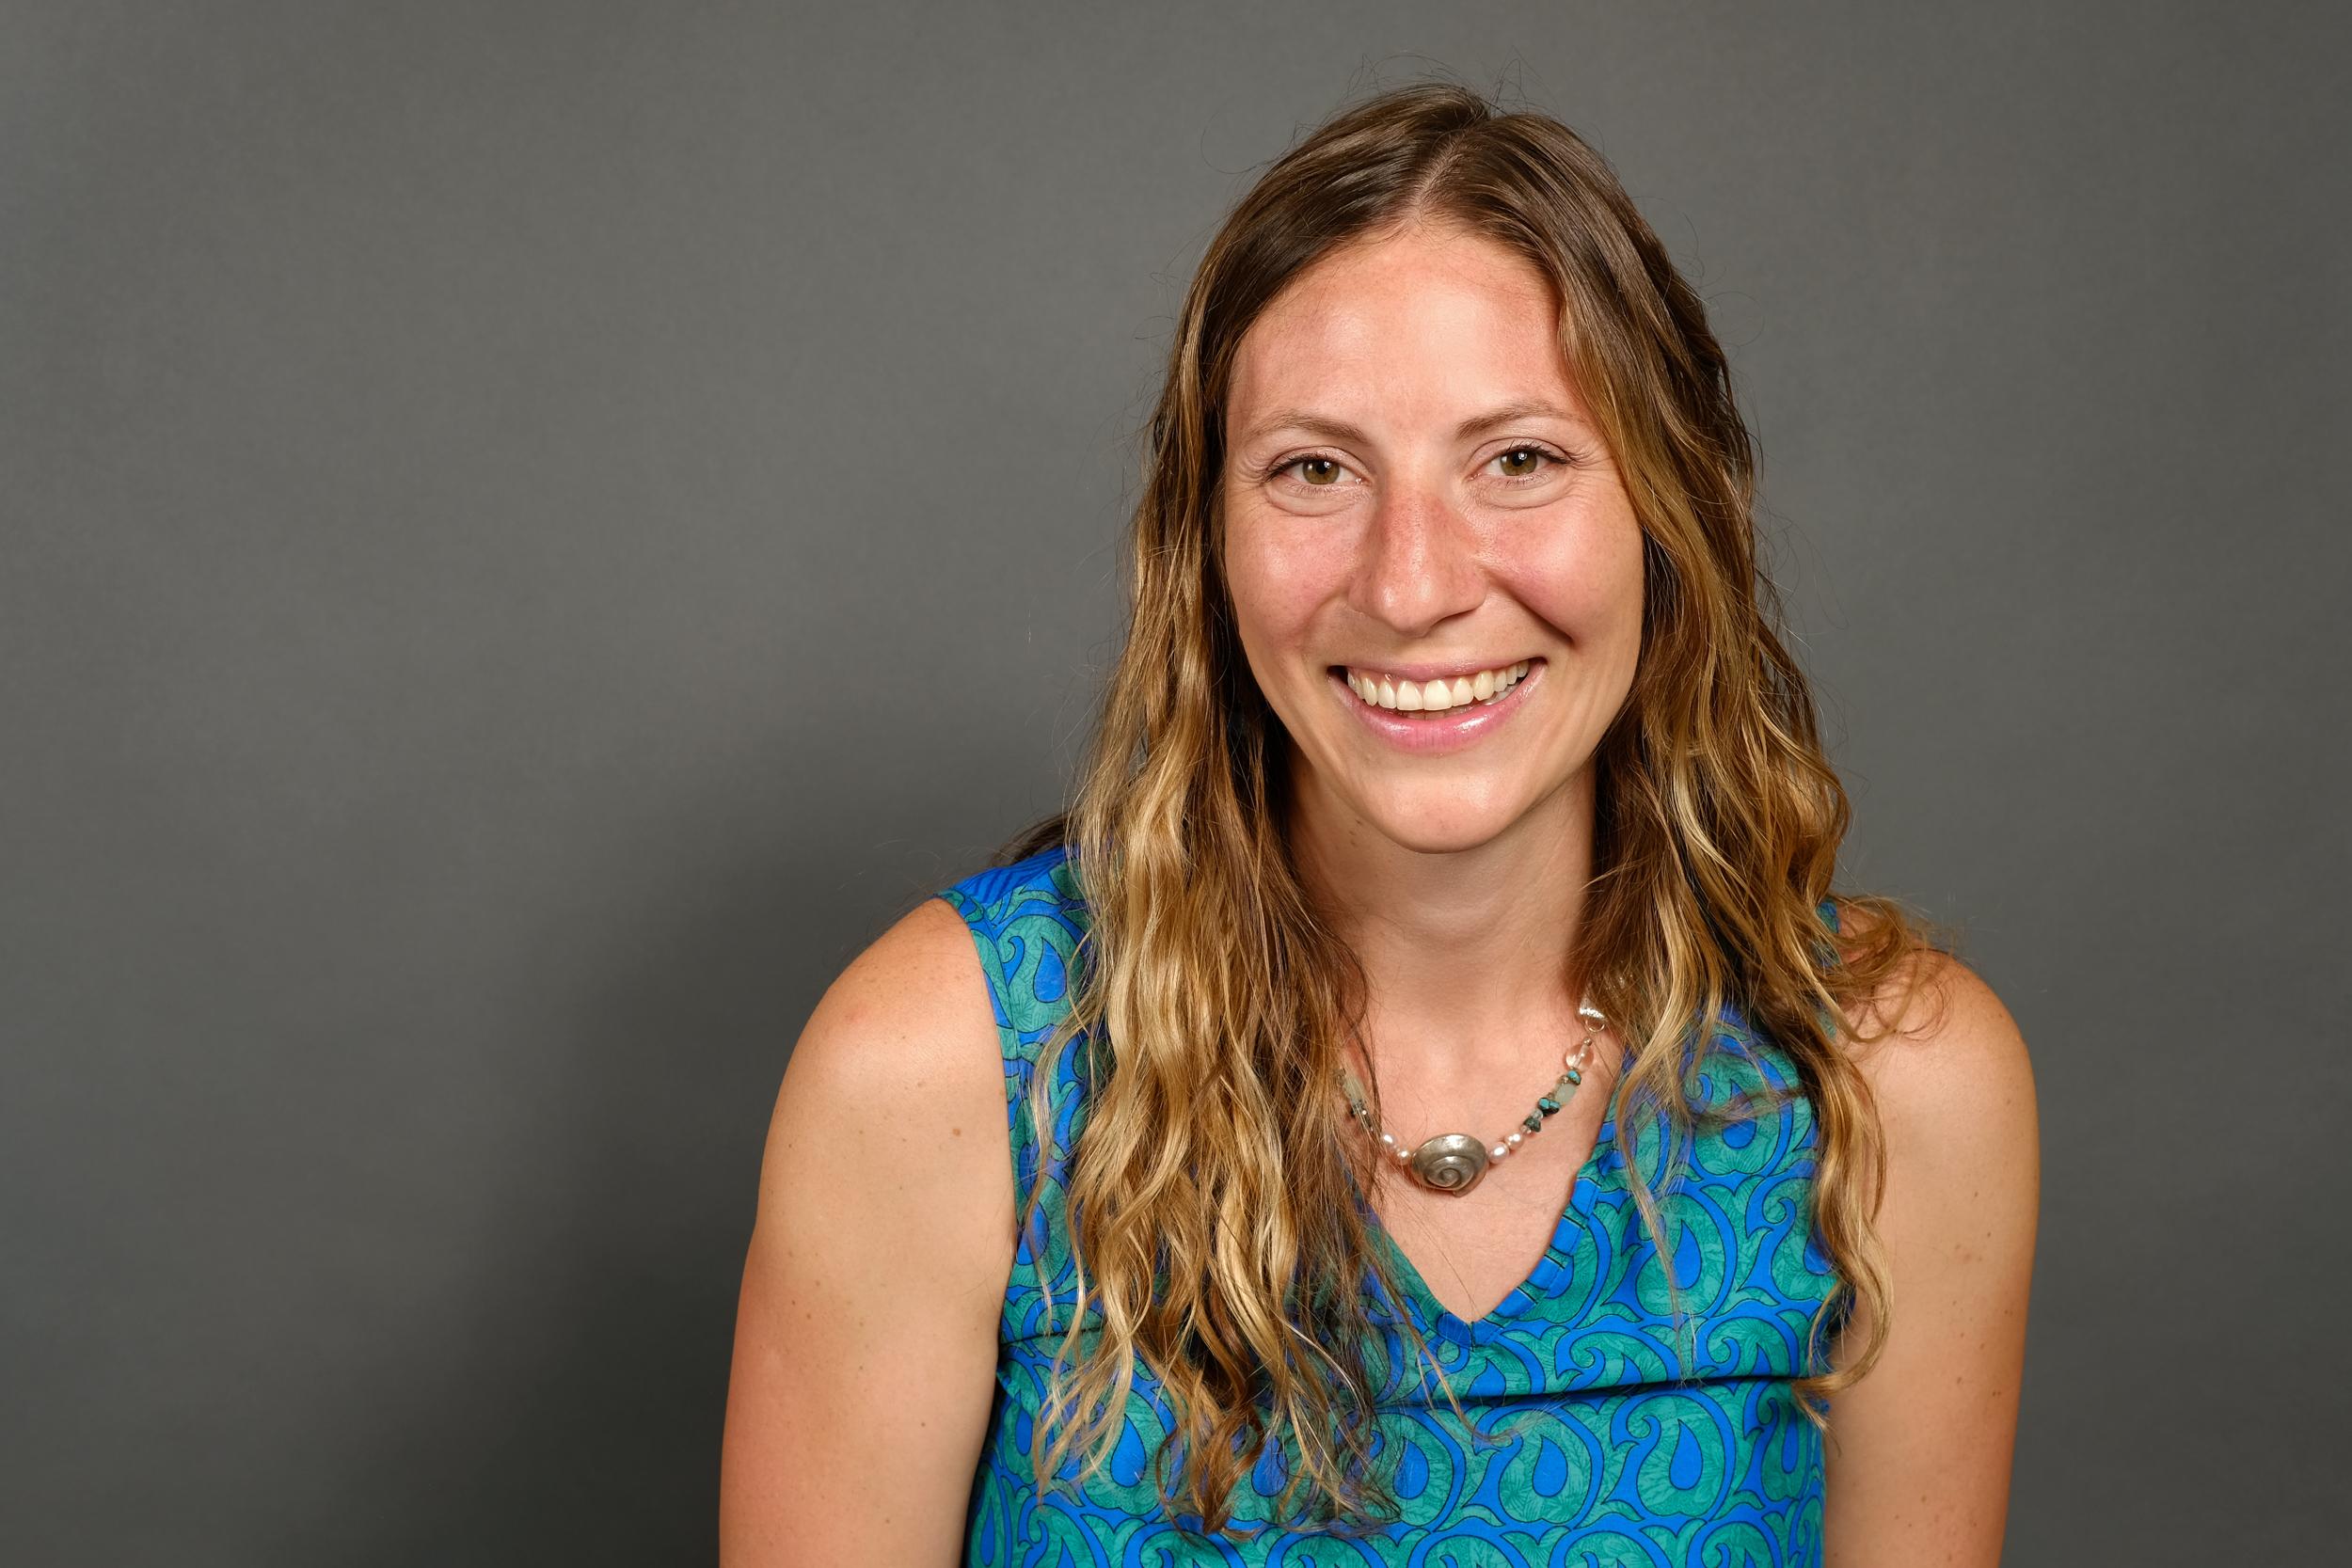 Meredith Kopelman